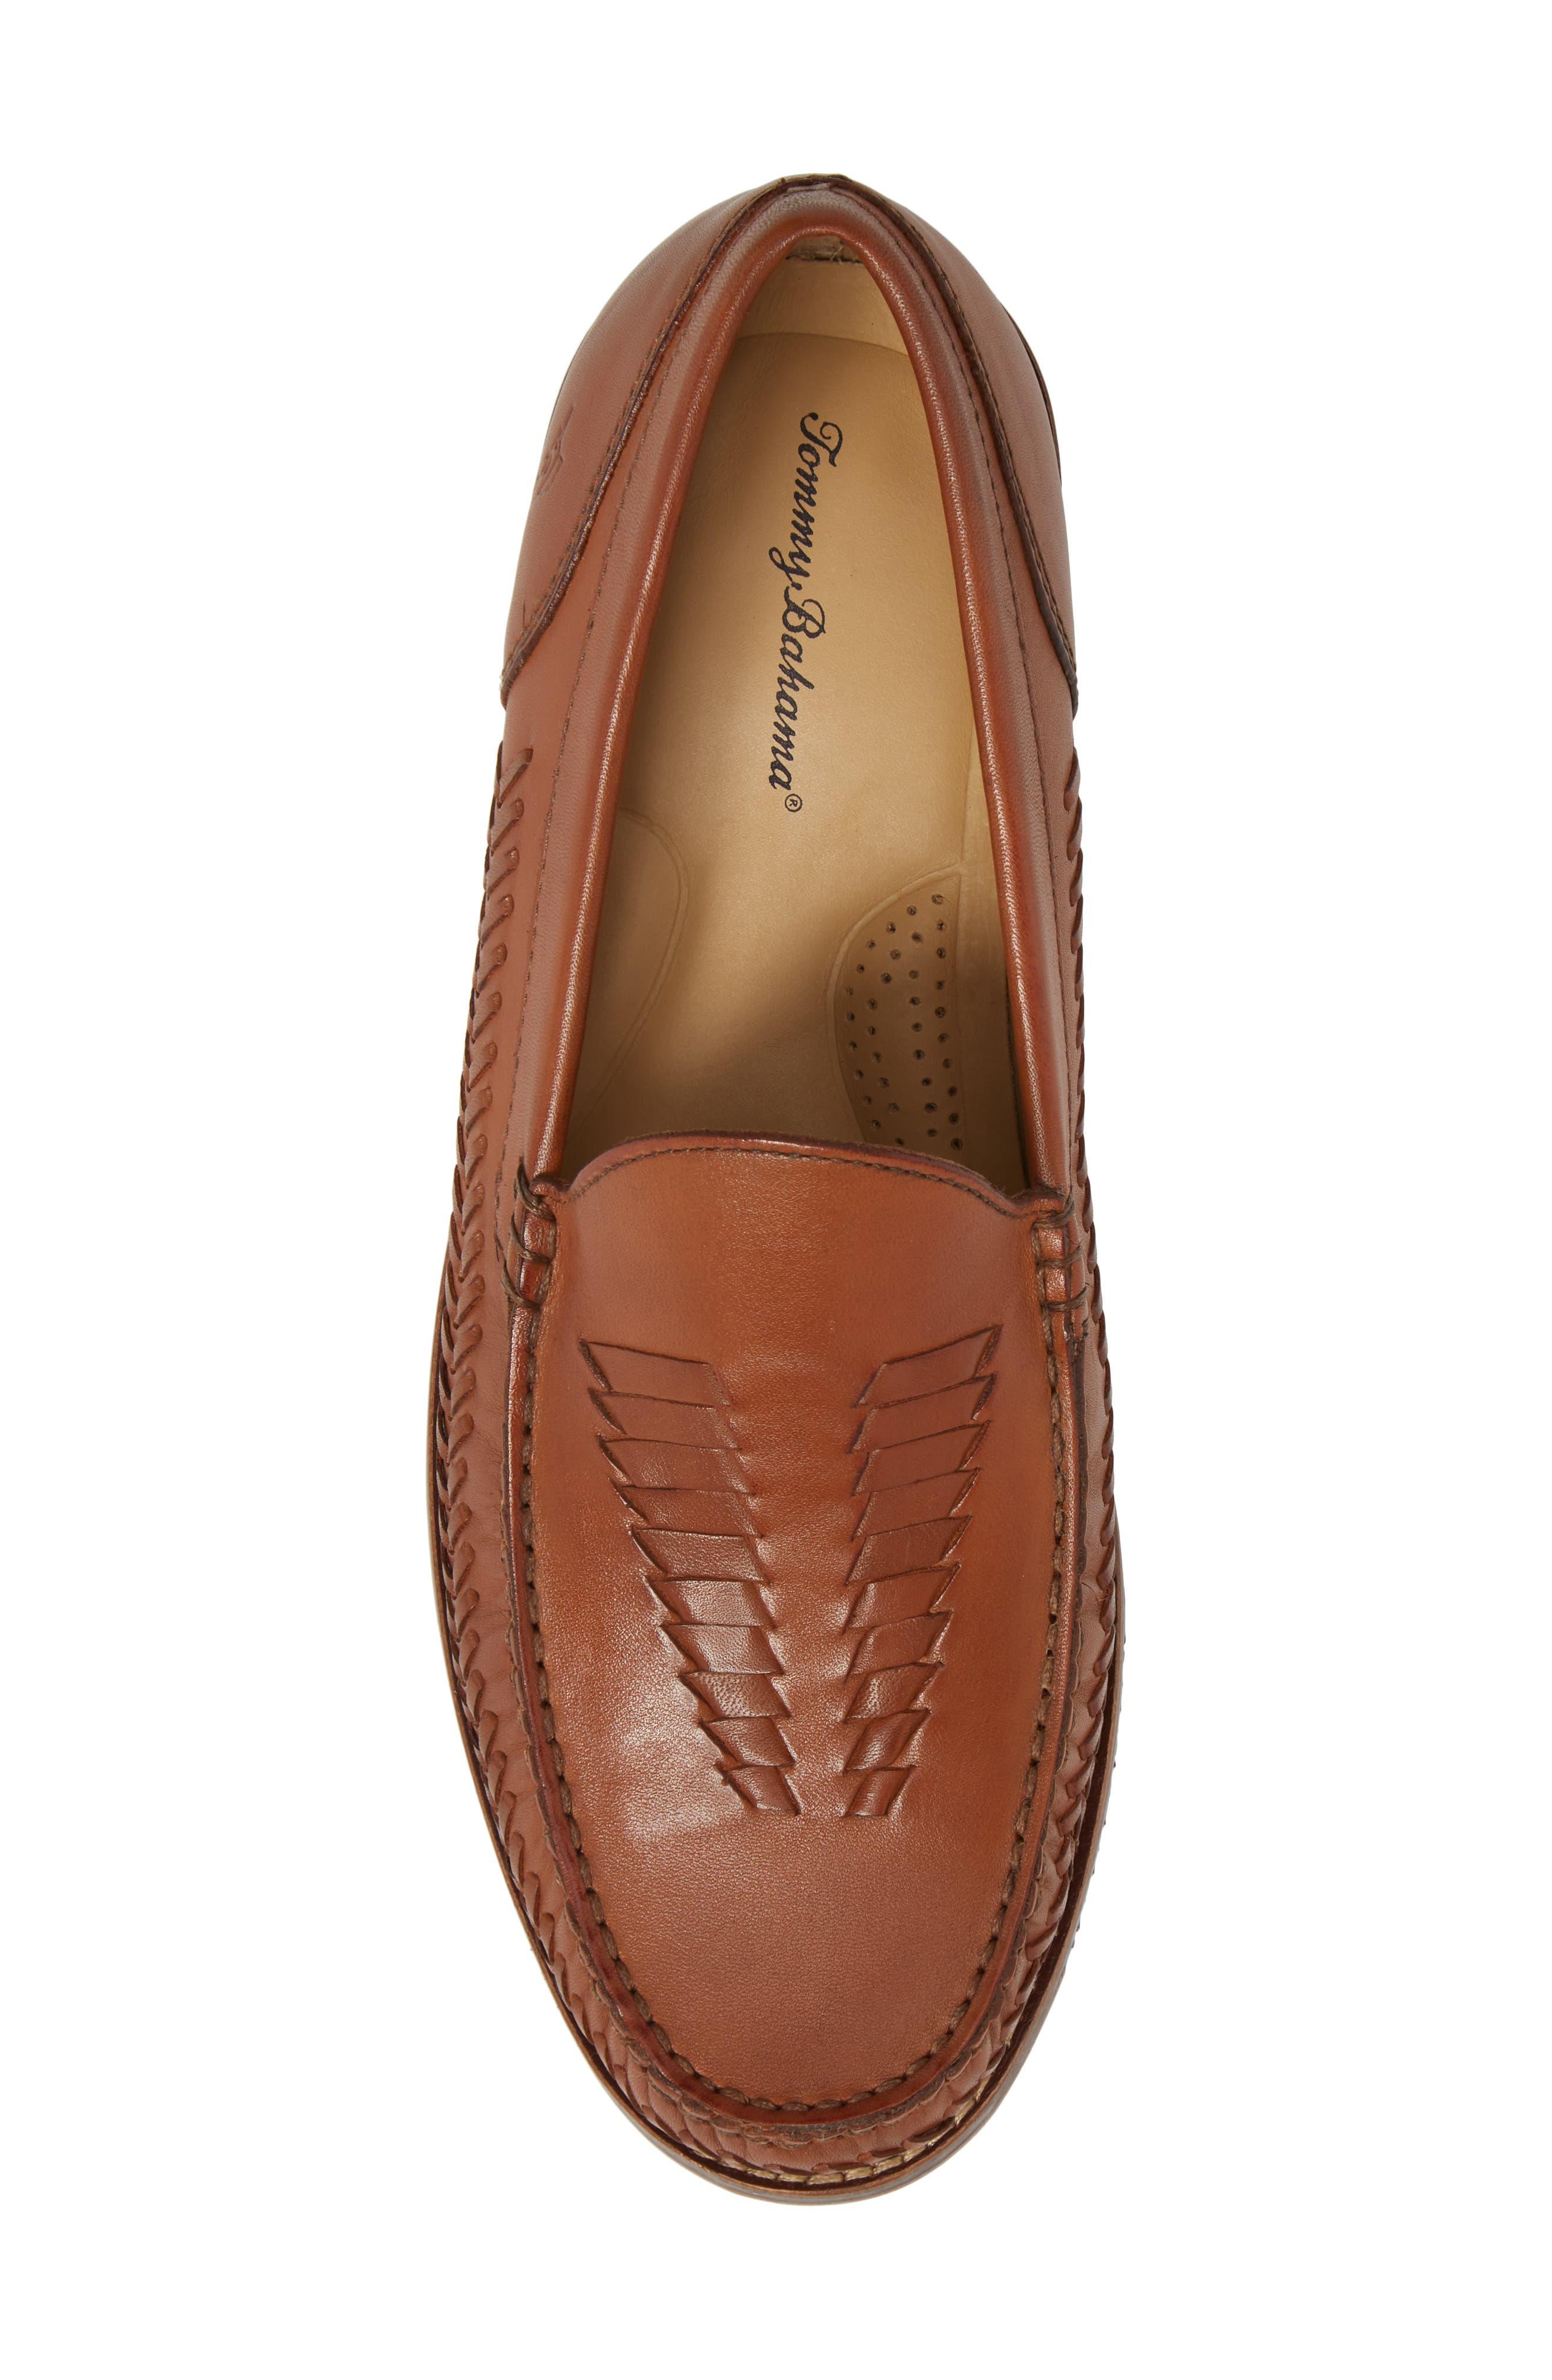 Hasslington Woven Venetian Loafer,                             Alternate thumbnail 5, color,                             Tan Leather